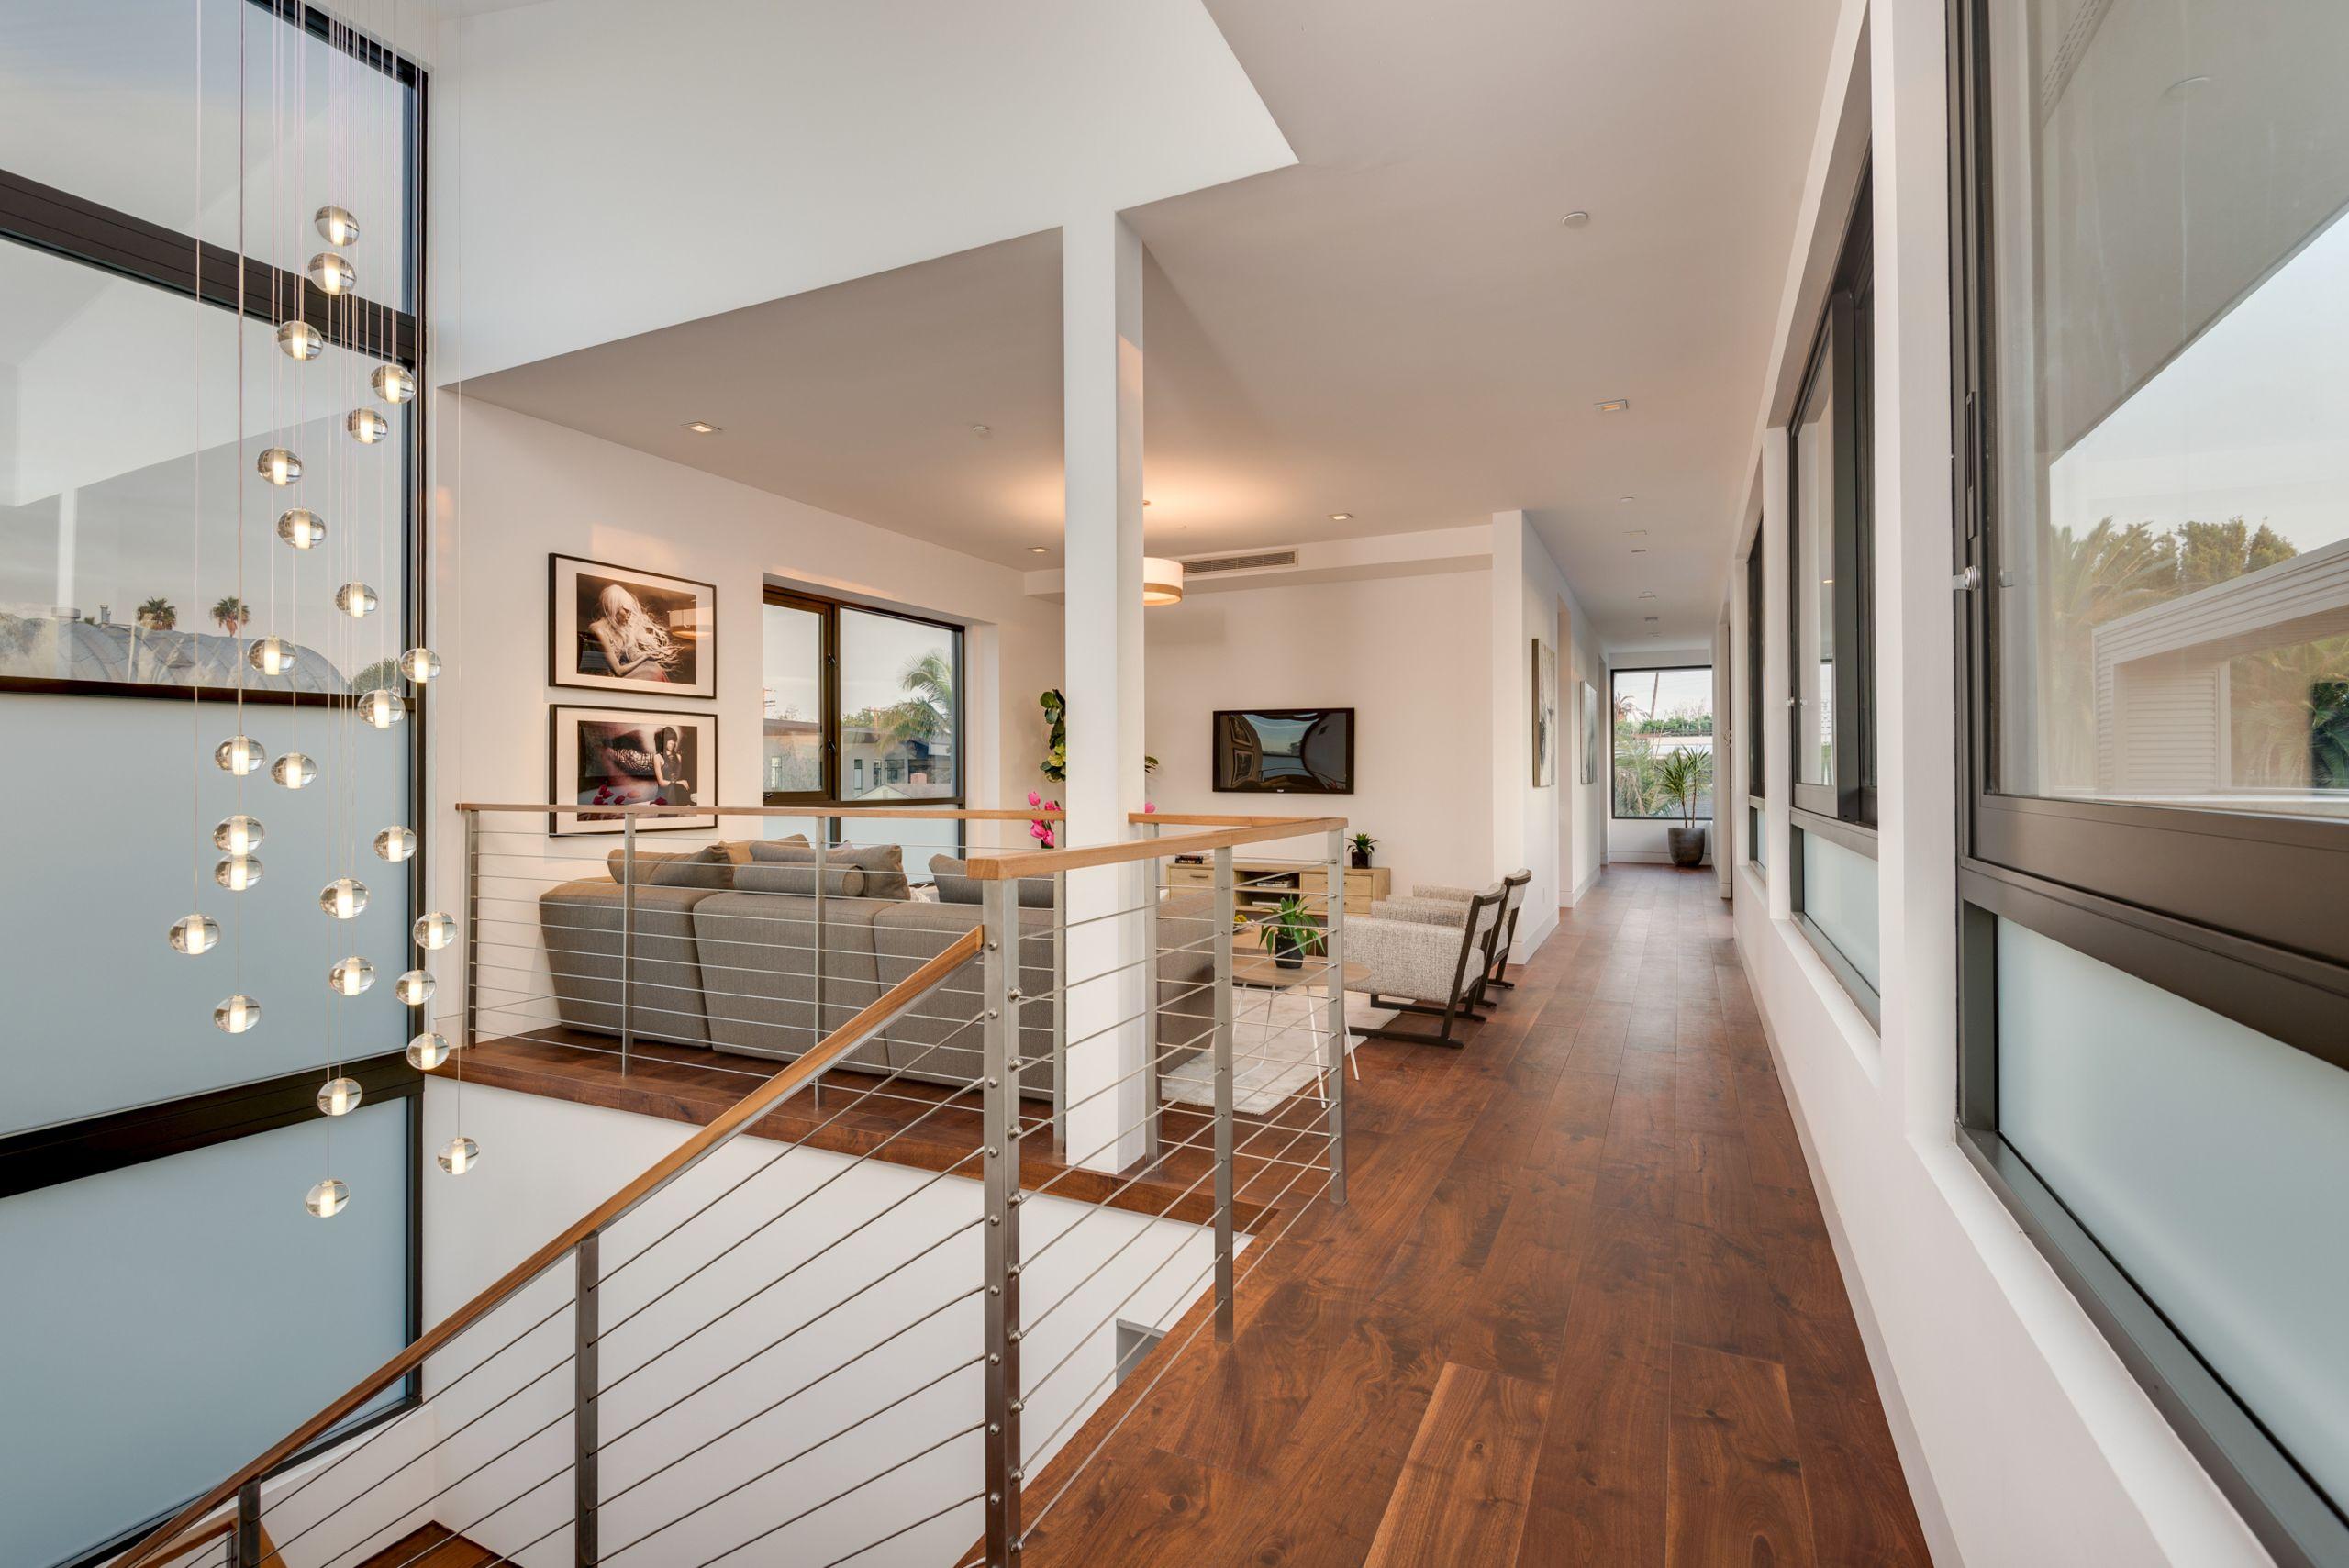 521 Vernon Ave., Venice Beach - Versatile floor plan